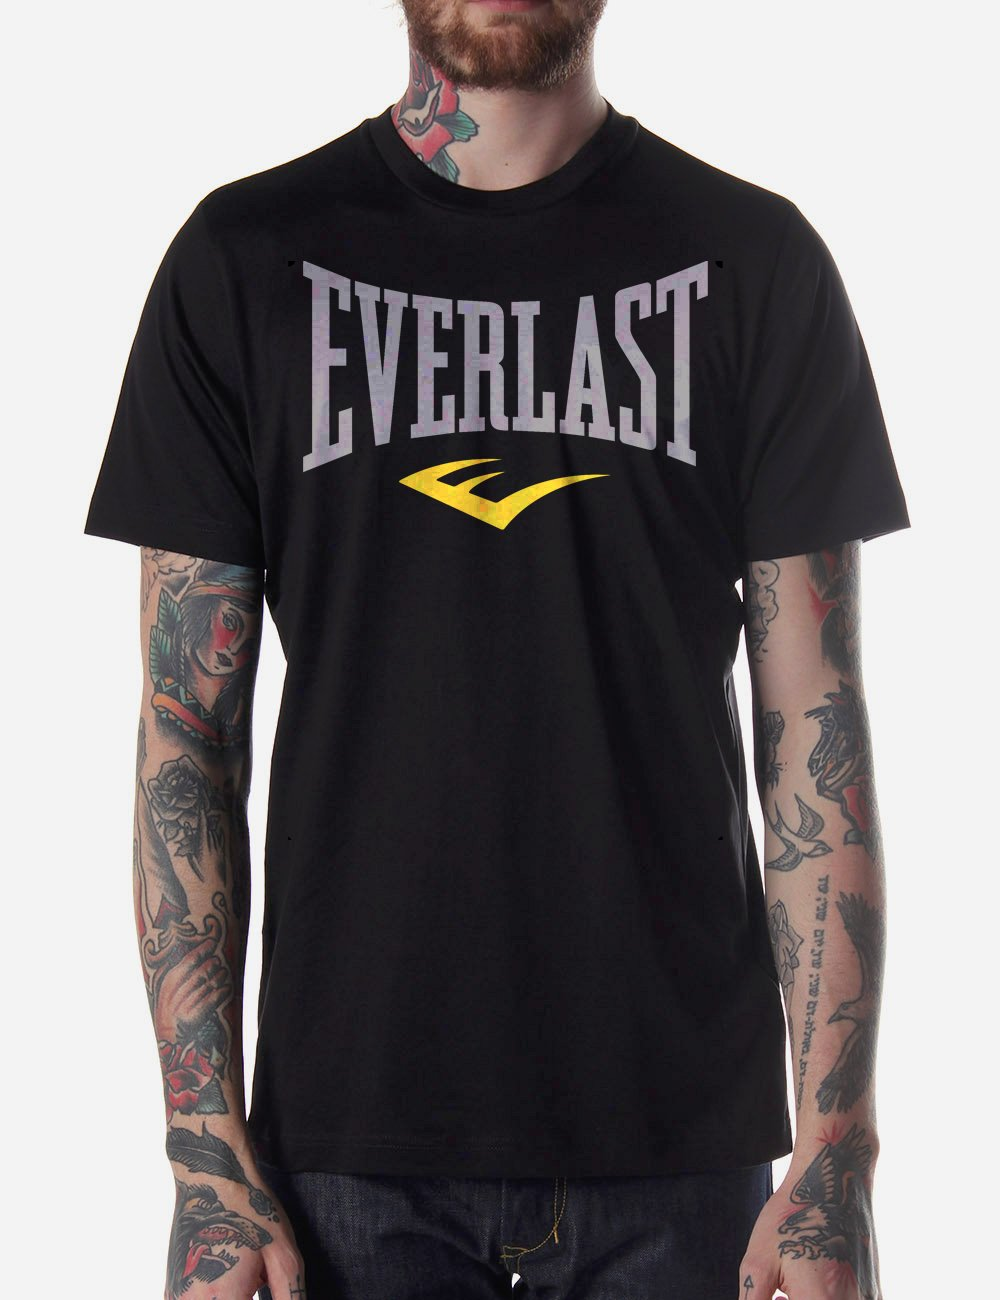 Black Men Tshirt EVERLAST Black Tshirt For Men